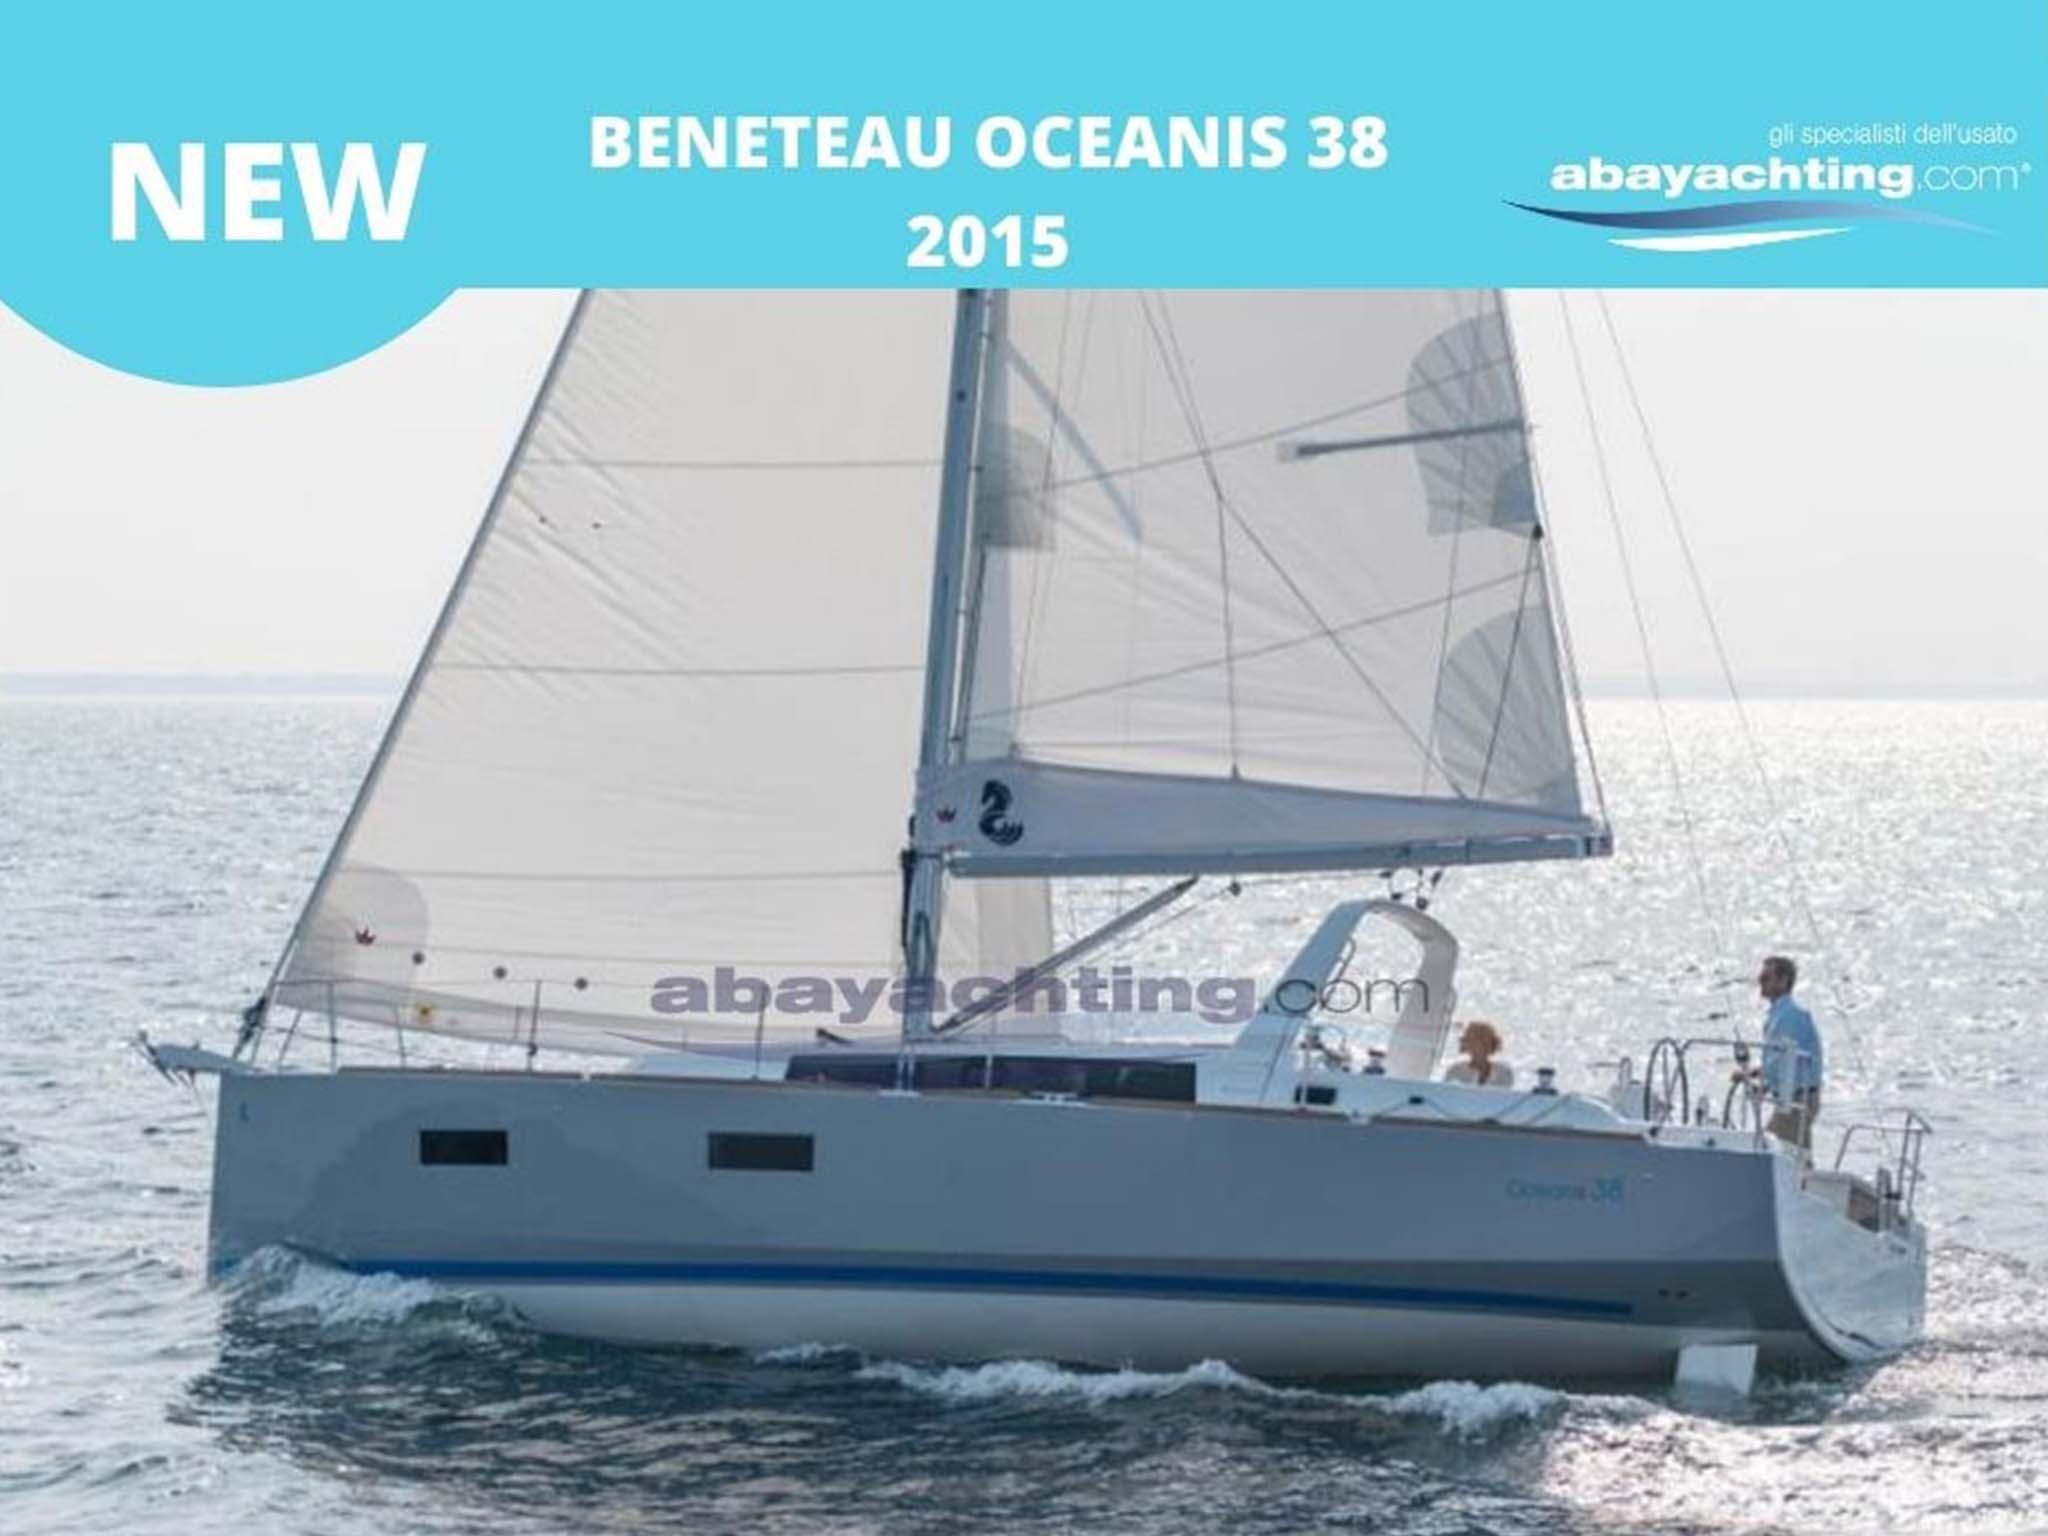 New arrival Beneteau Oceanis 38